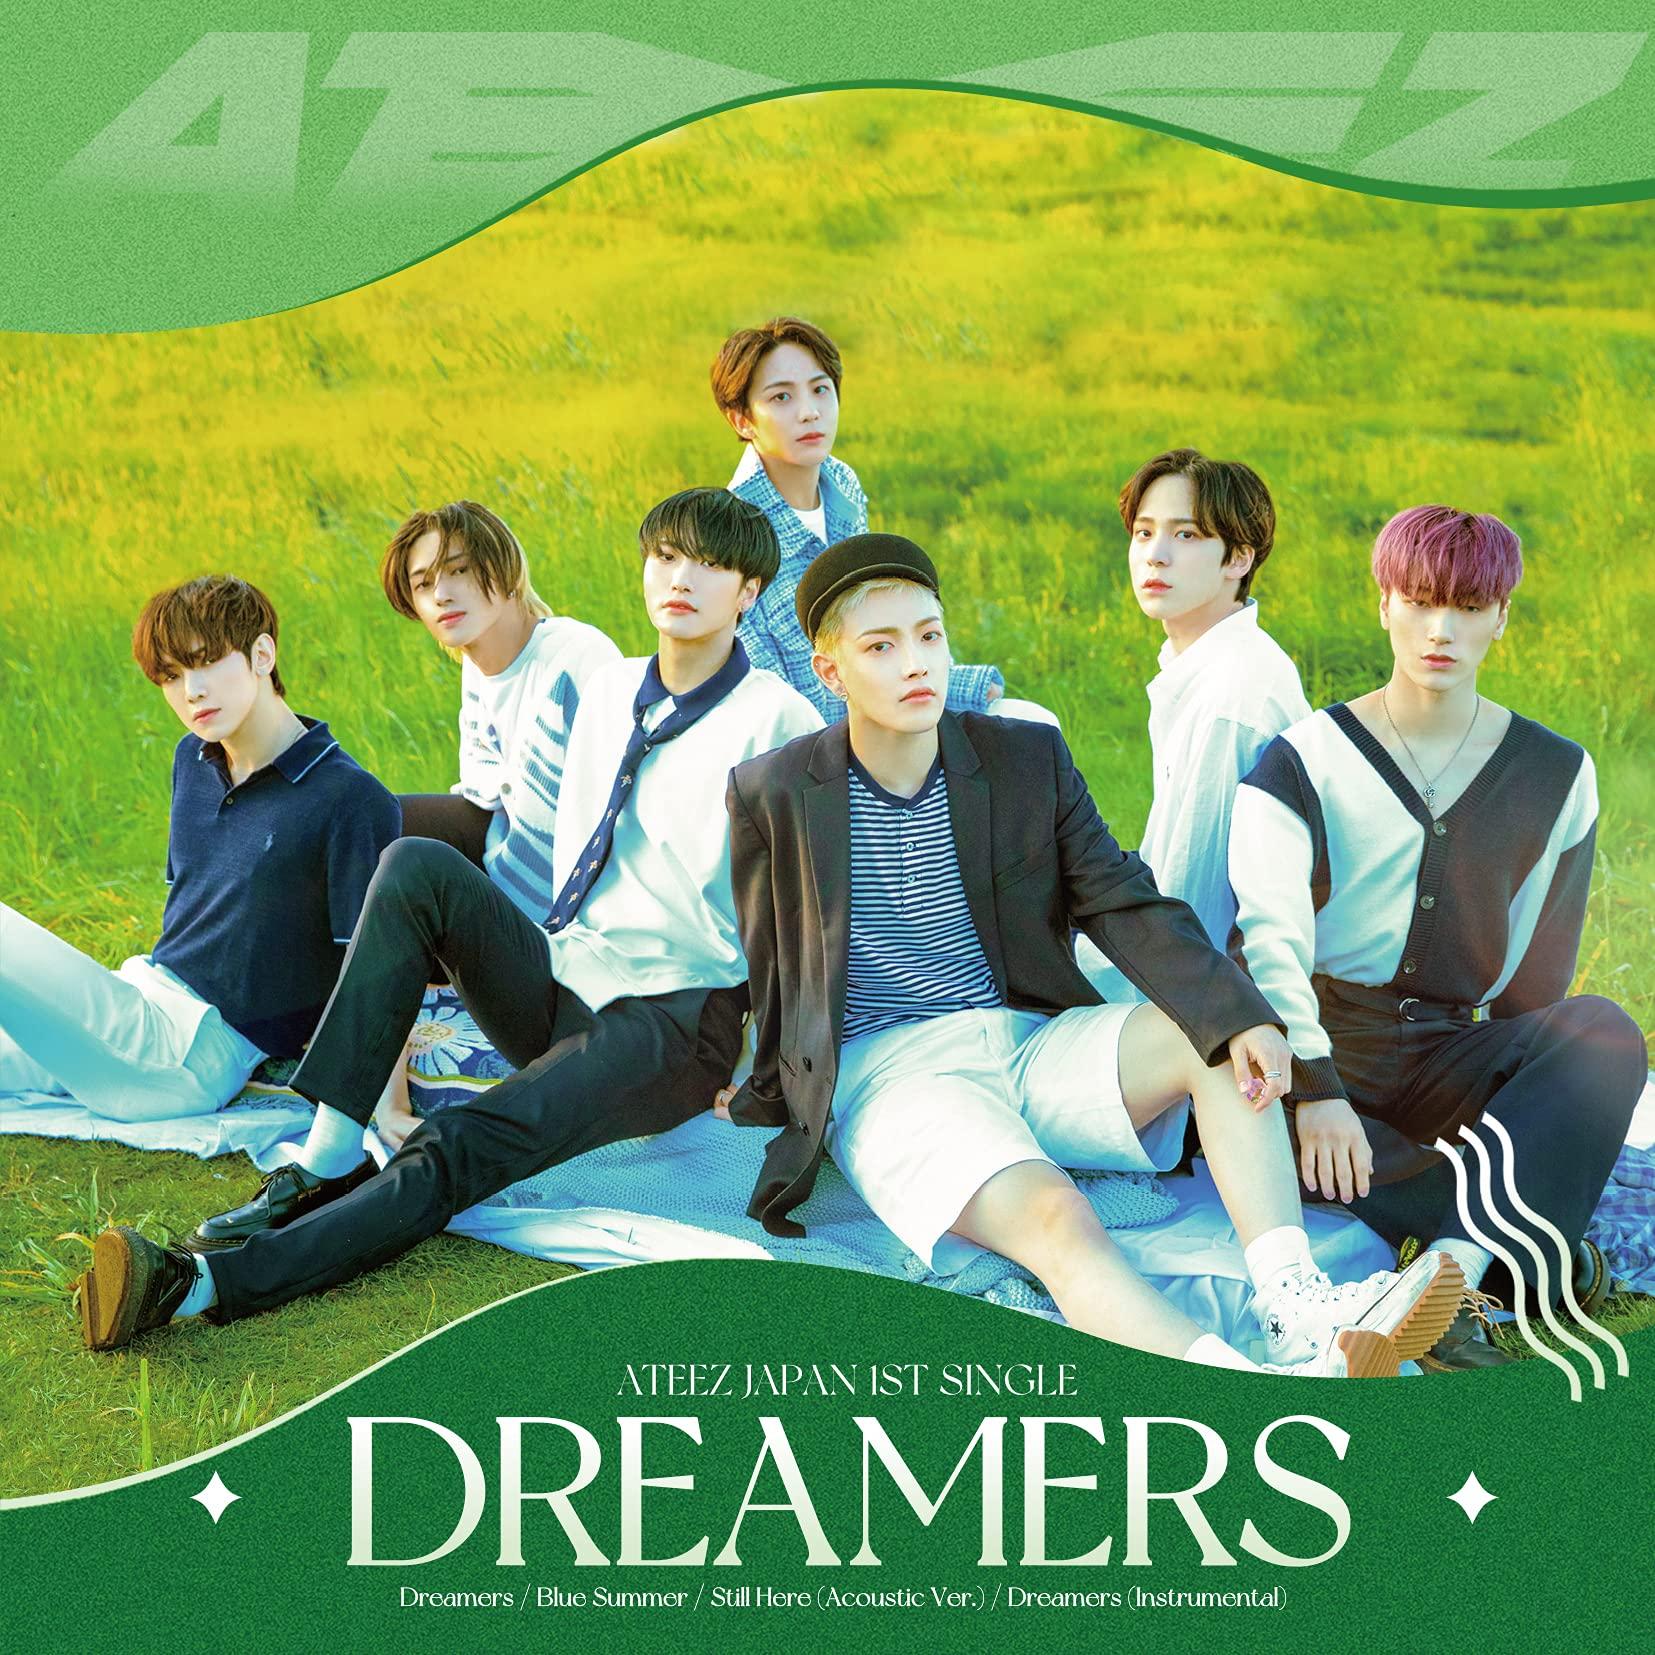 dreamers_cover_july3_2021.jpg